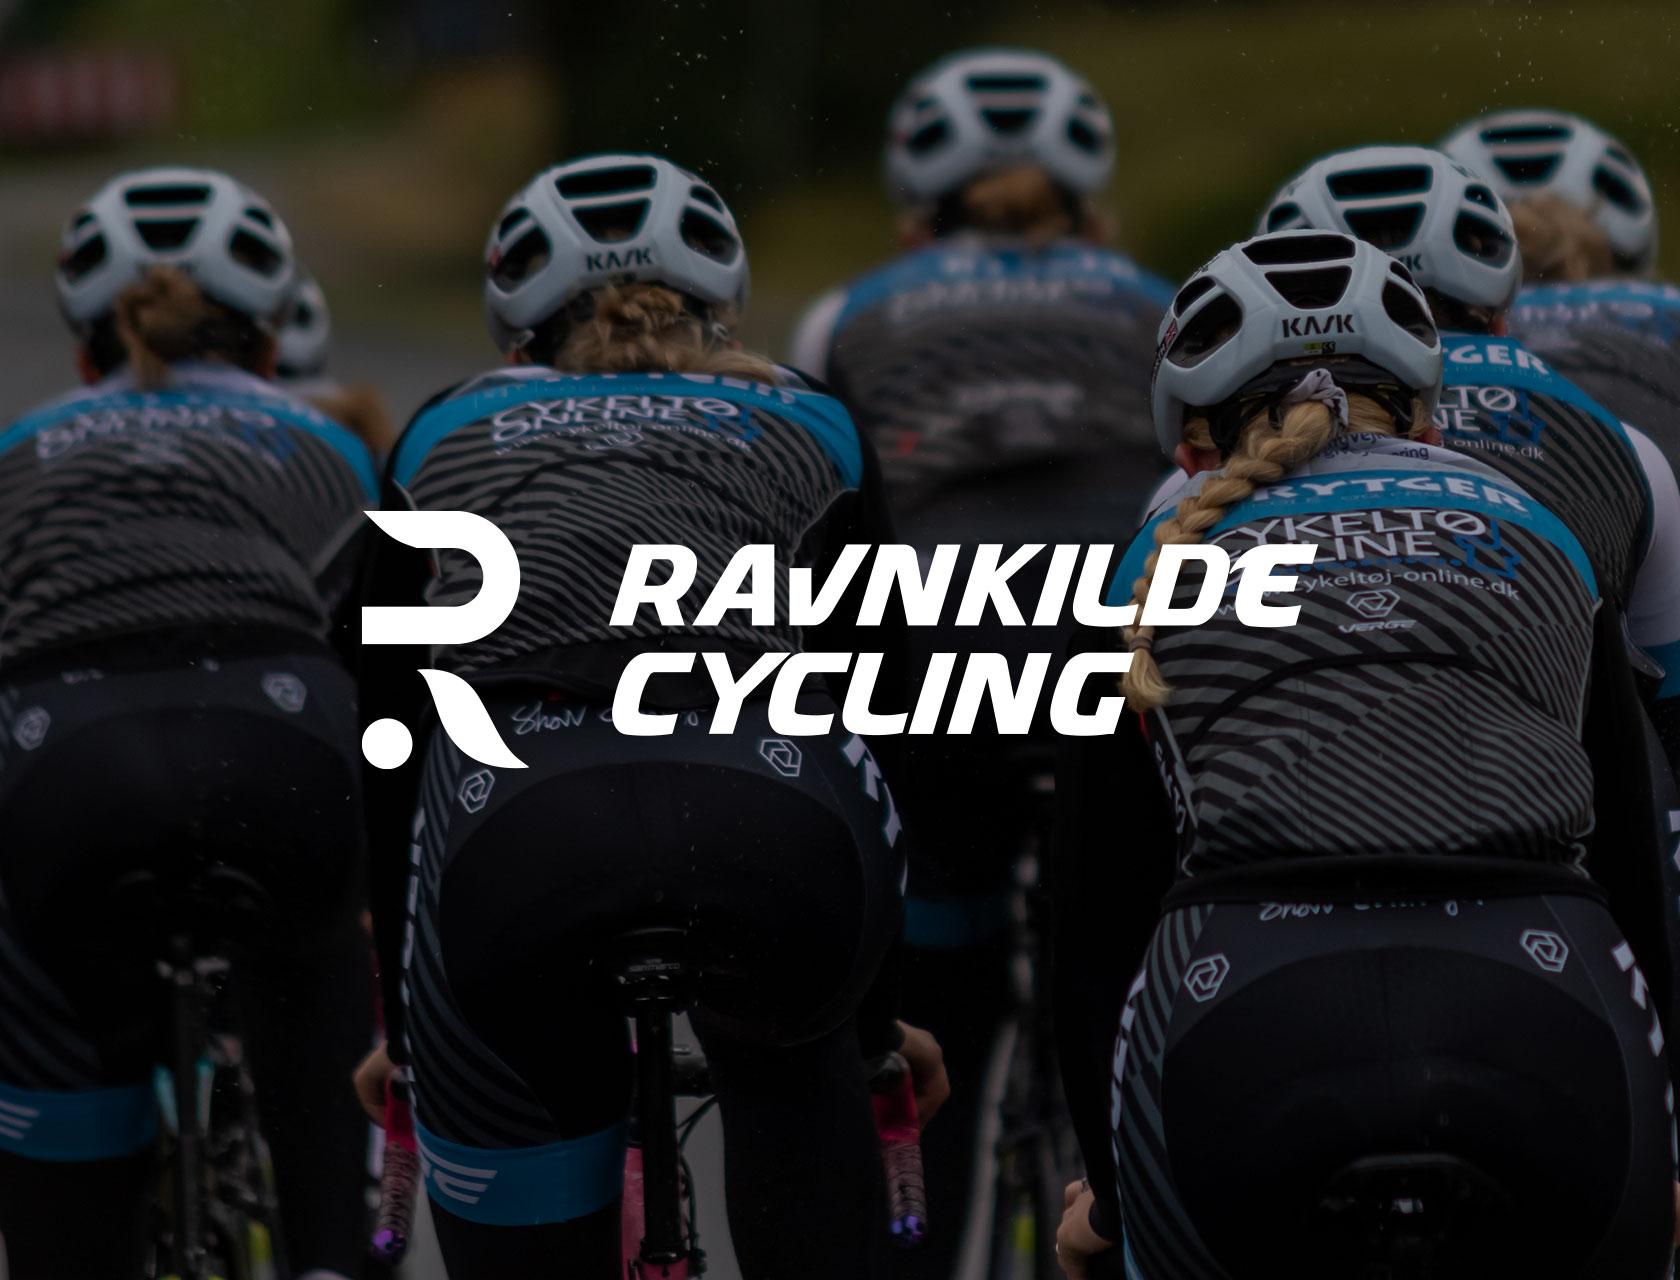 Ravnkilde Cycling nyt logo samt SoMe materiale